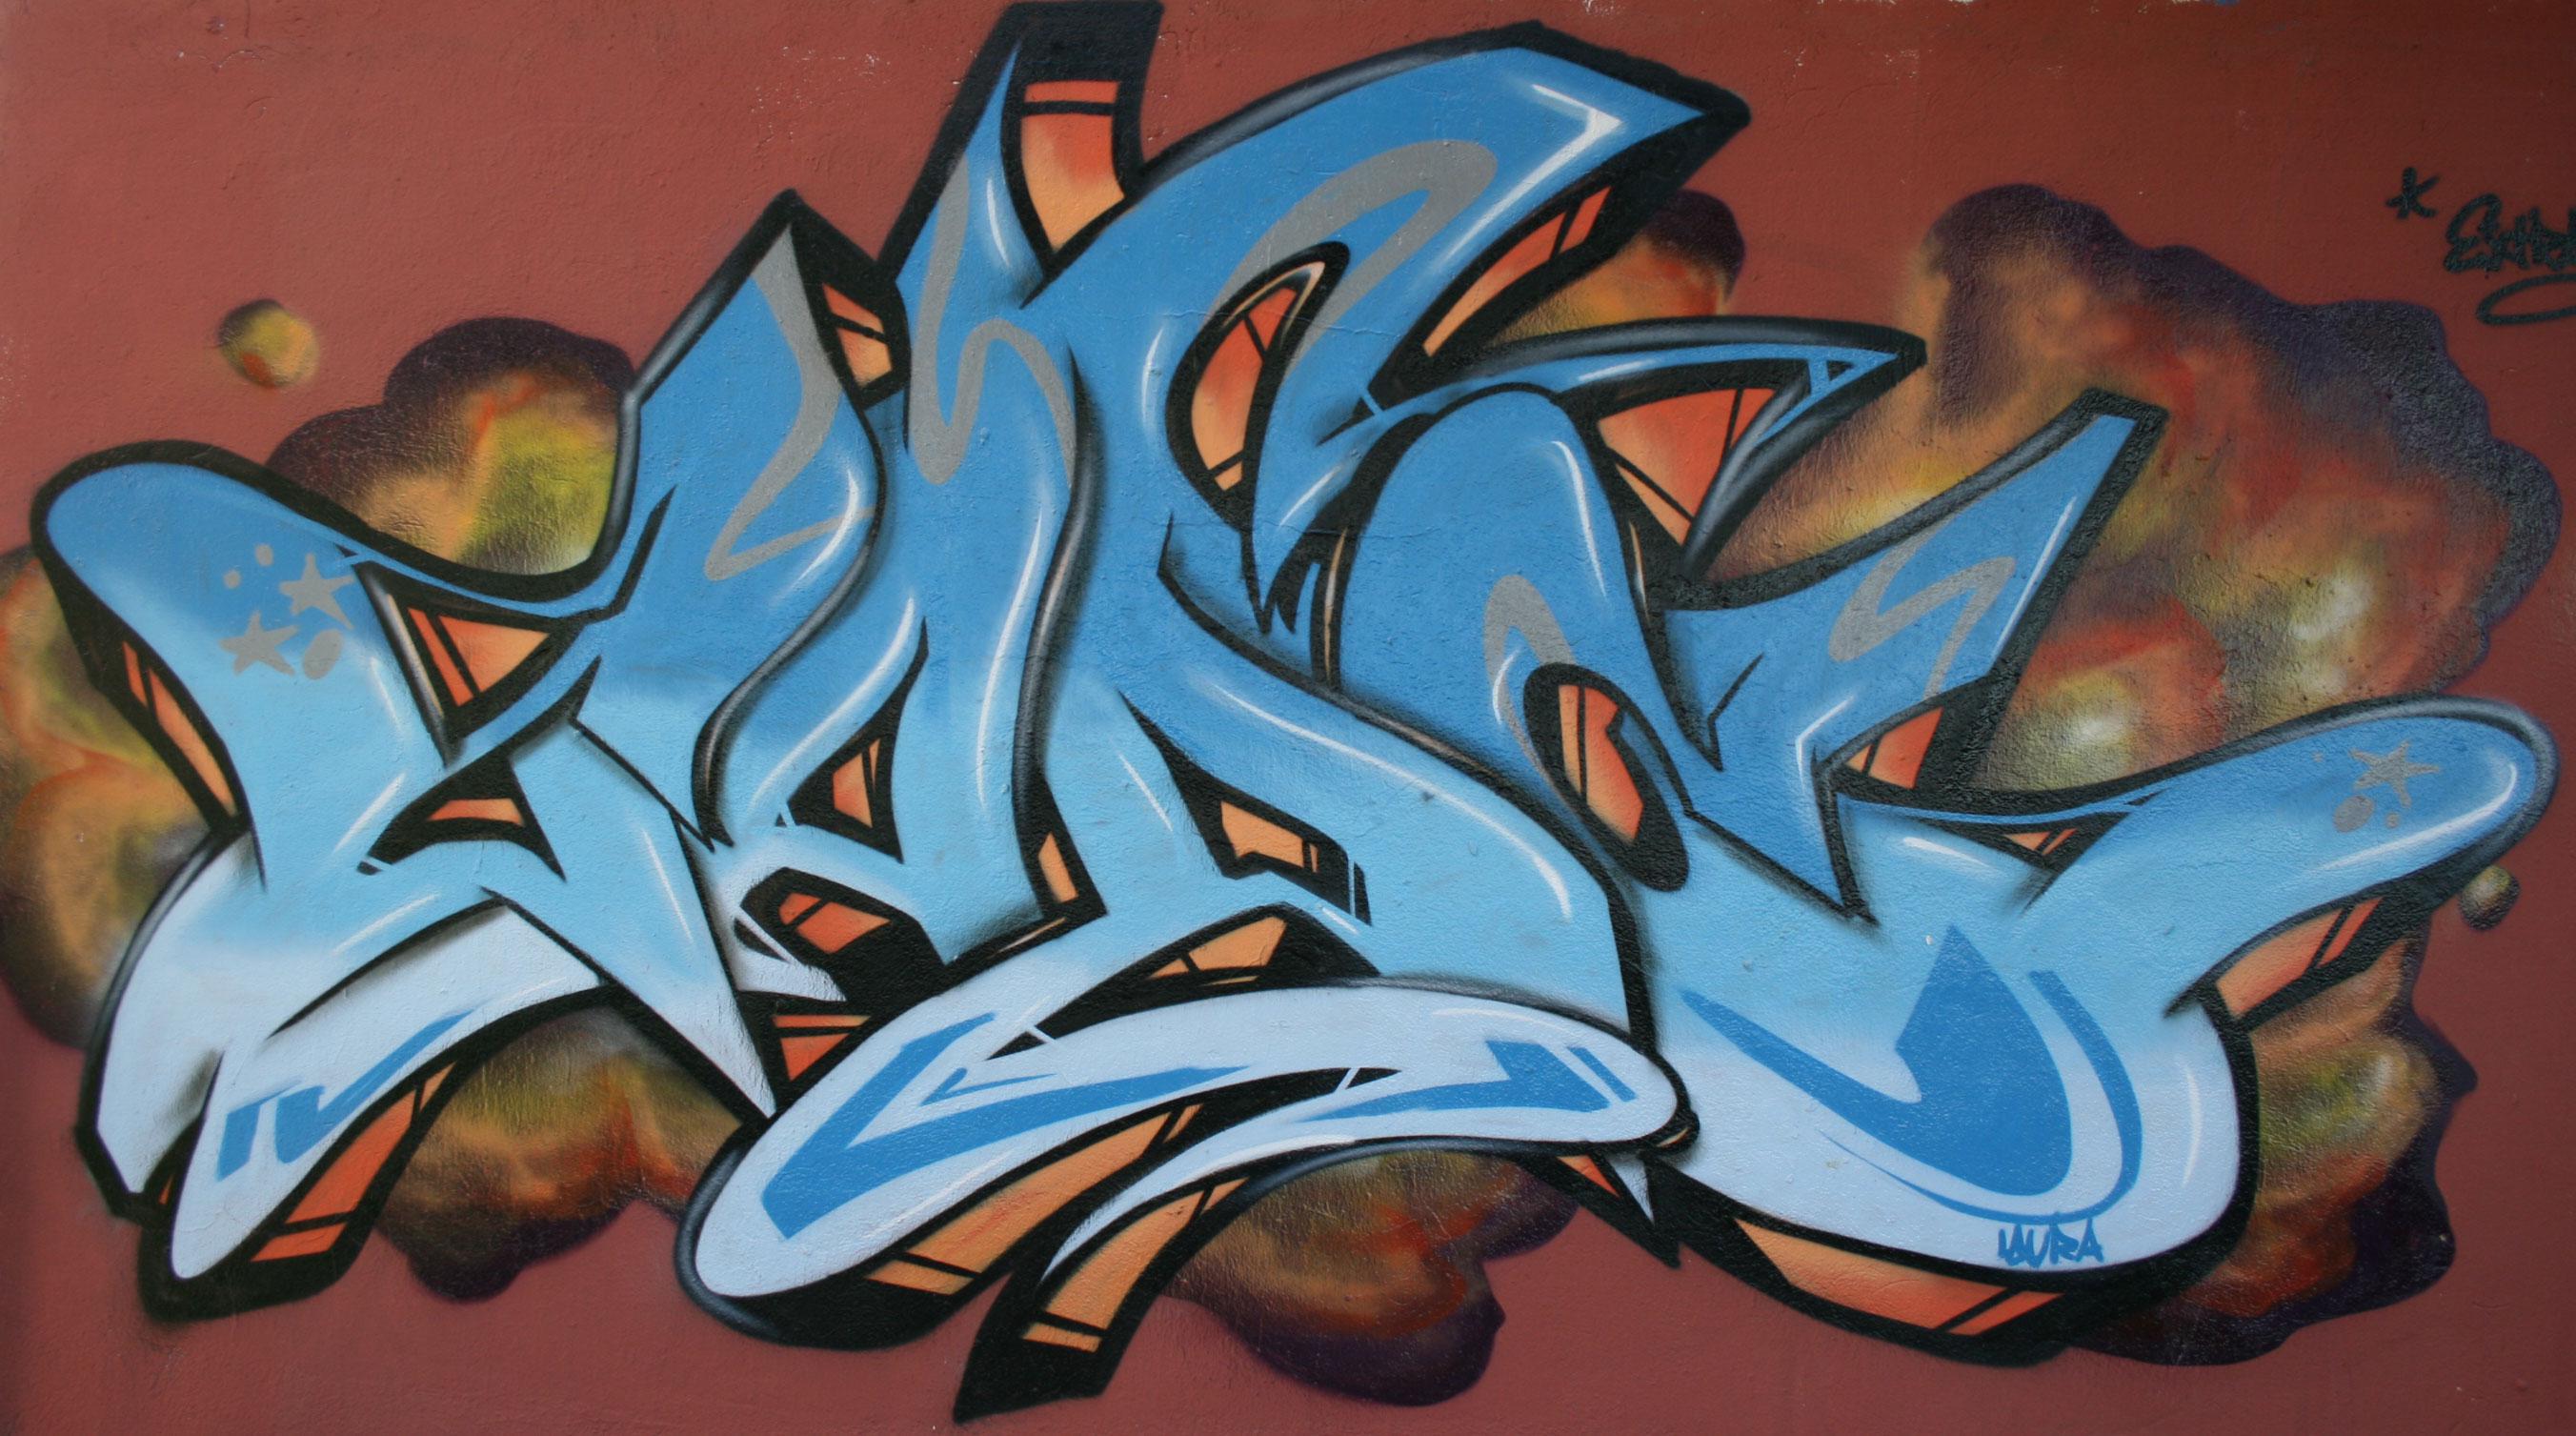 Voy a tirar mi primer bomba estoy feliz d taringa - Bombe de graffiti ...